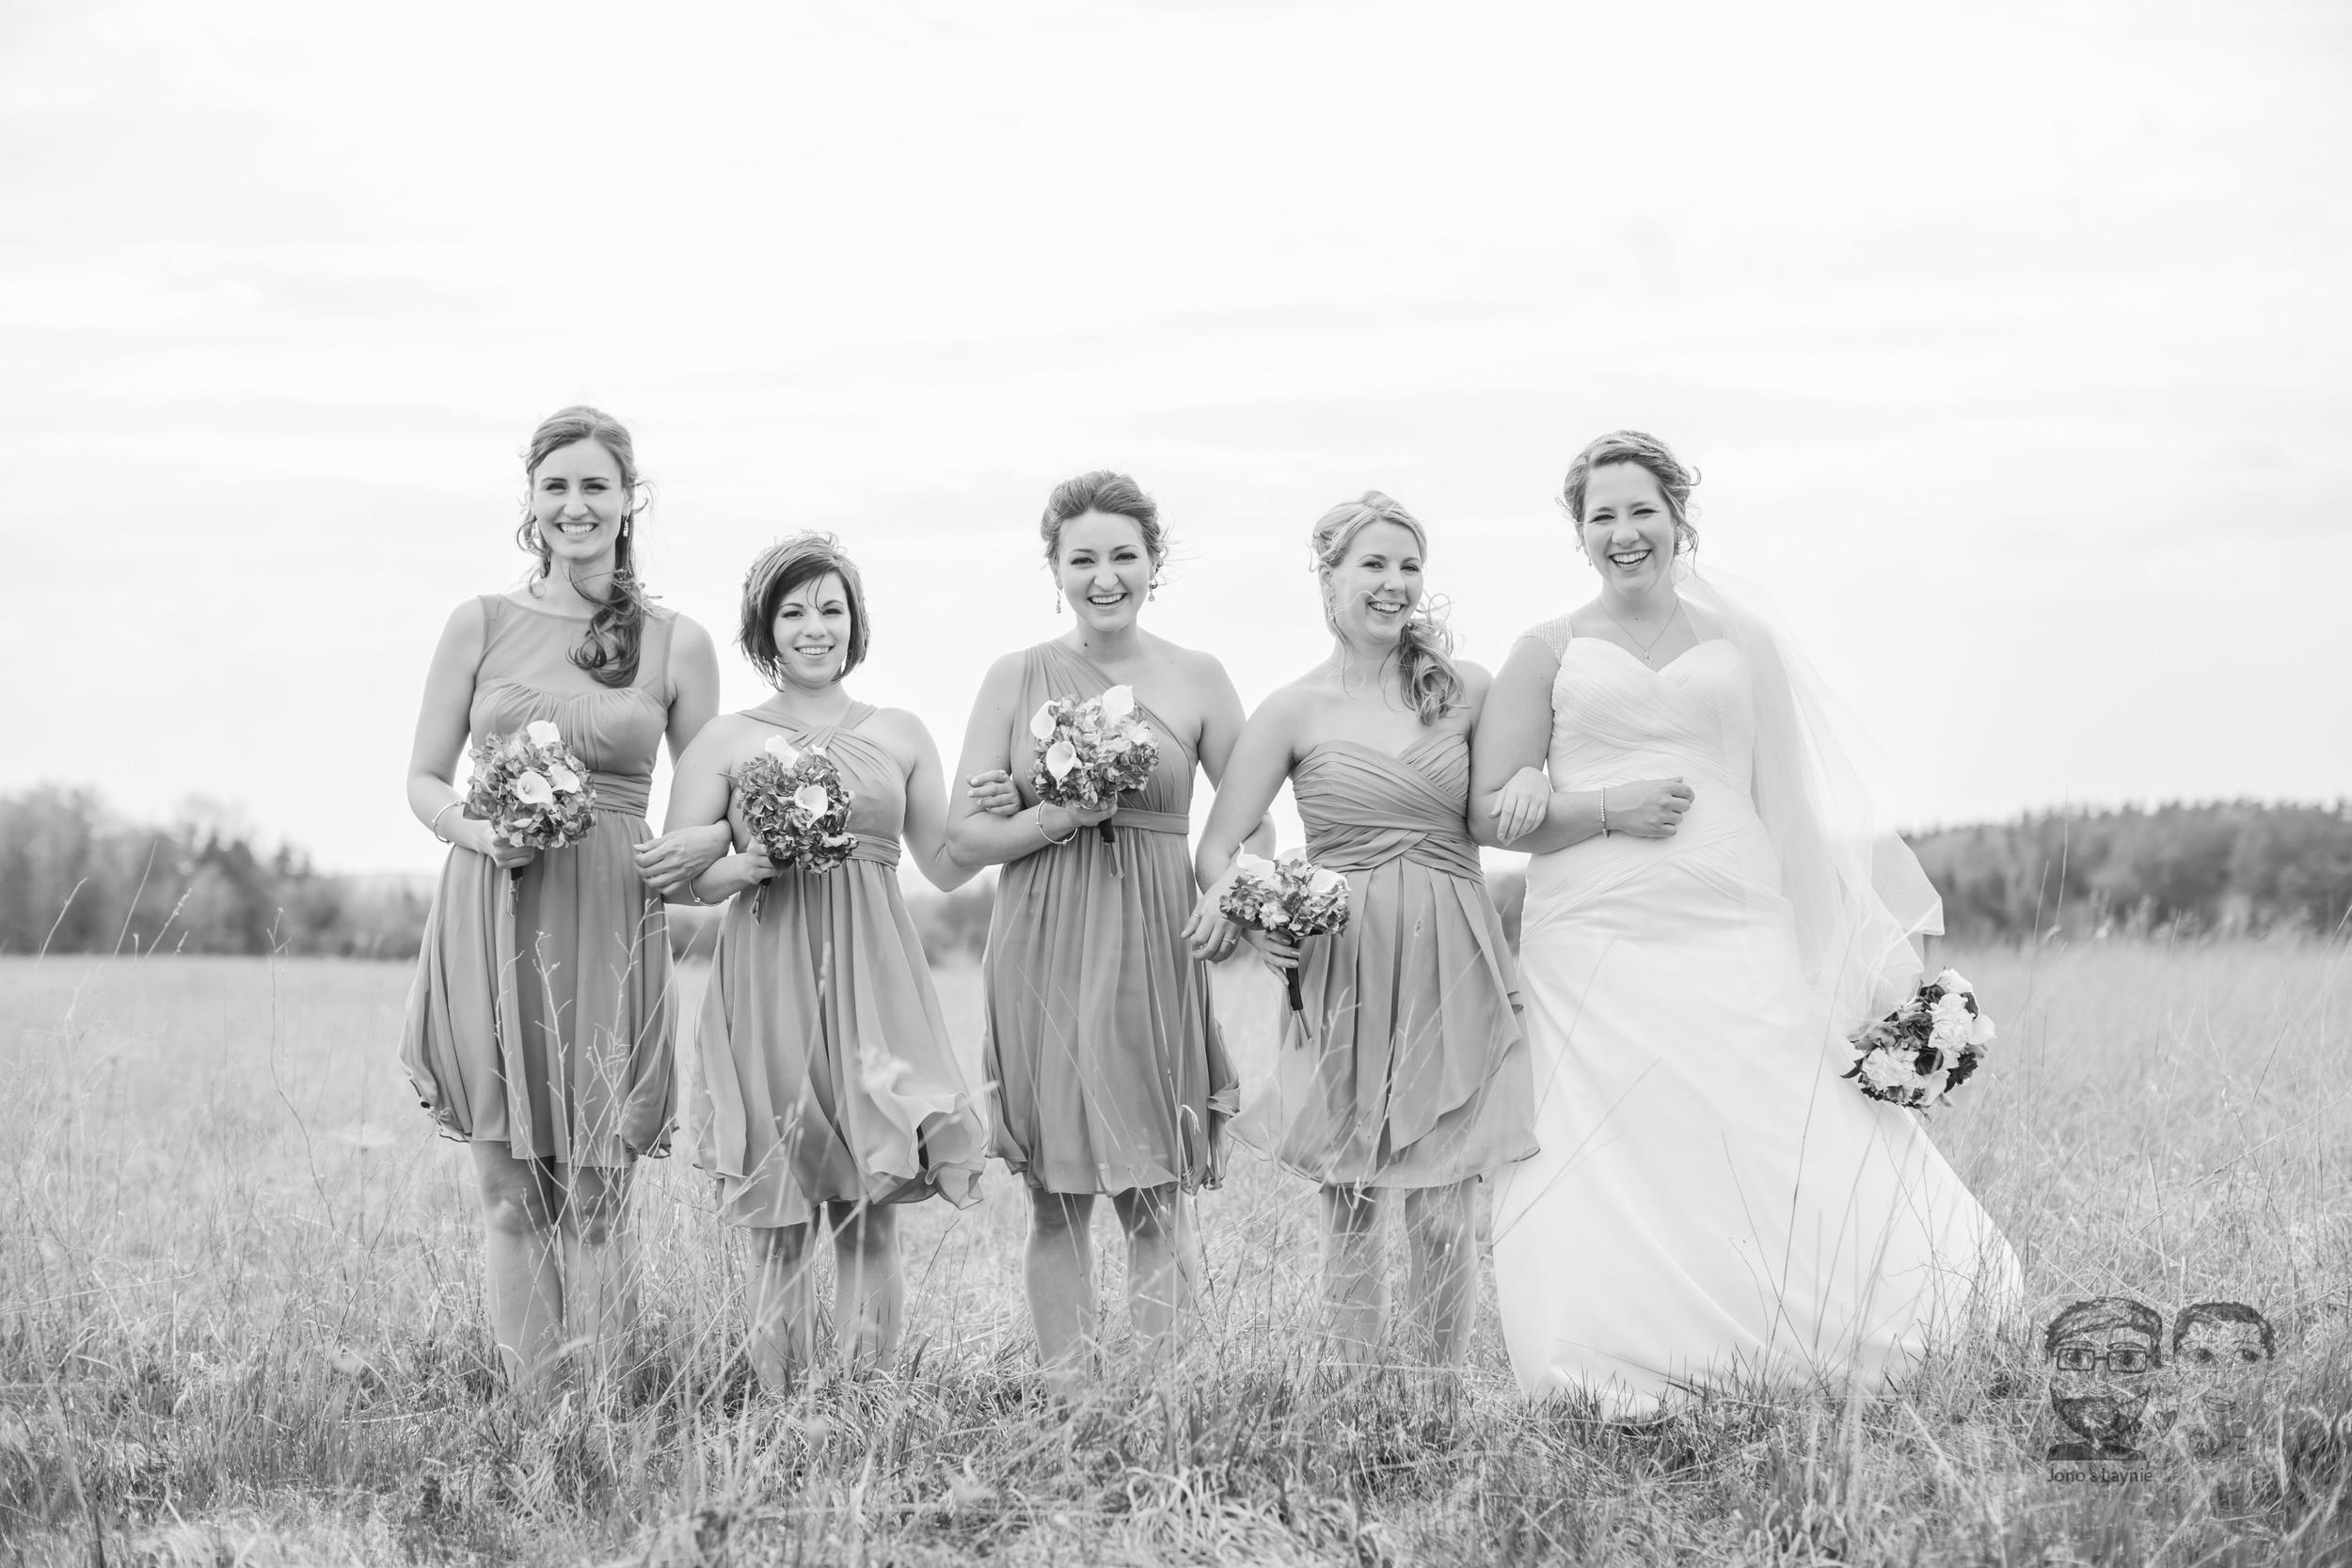 49Toronto Wedding Photographers and Videographers-Jono & Laynie Co.-Orangeville Wedding.jpg